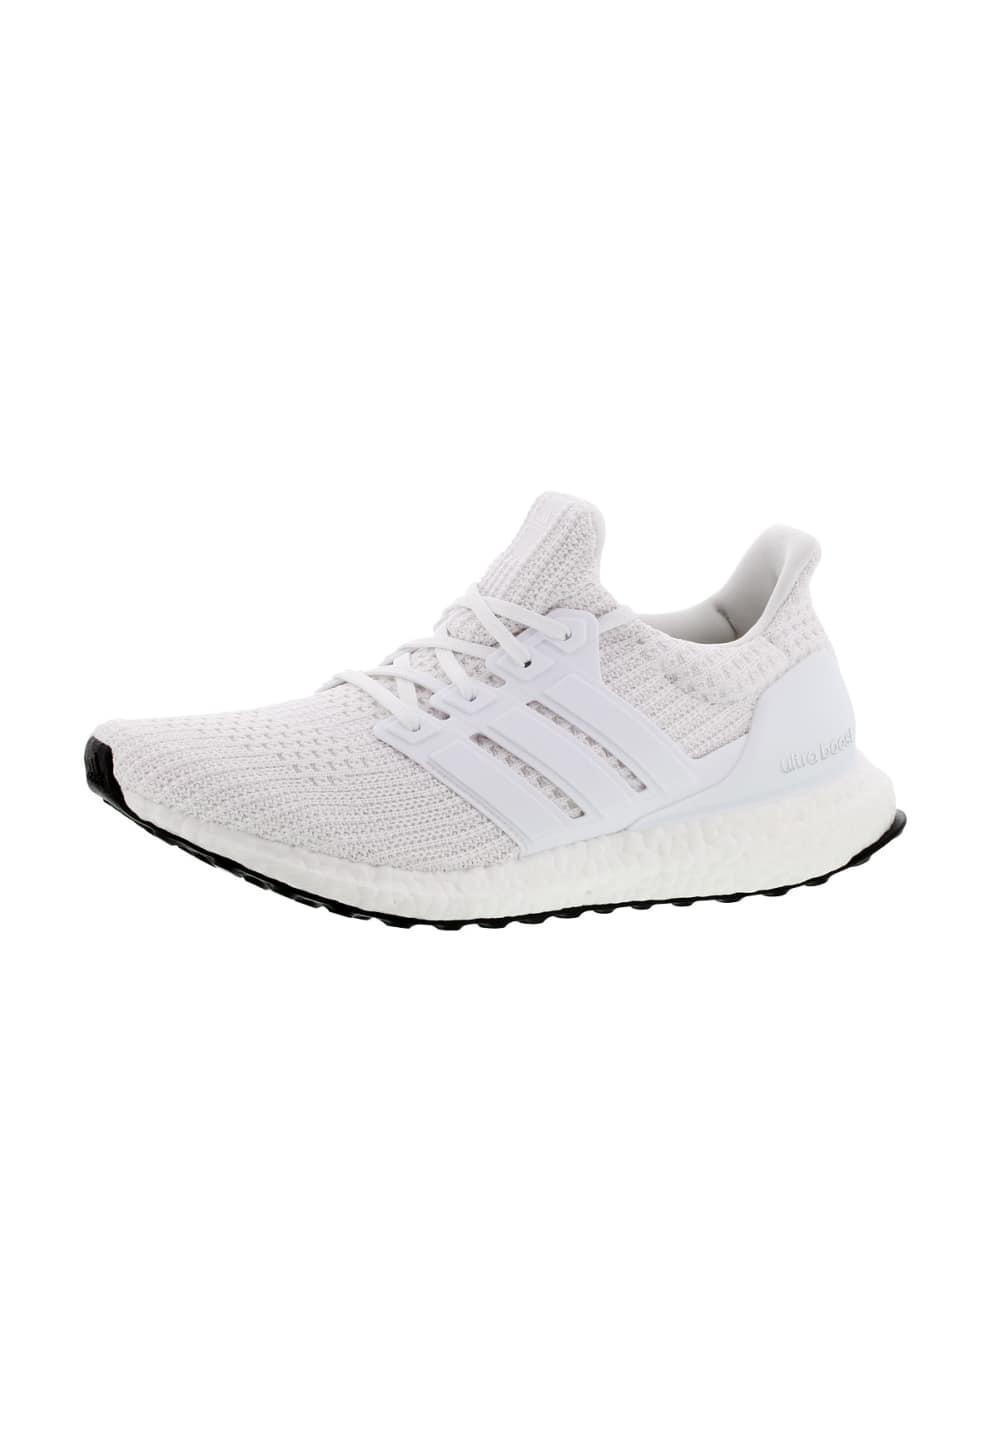 billig adidas Ultra Boost - Laufschuhe für Damen - Weiß 4321605fd5